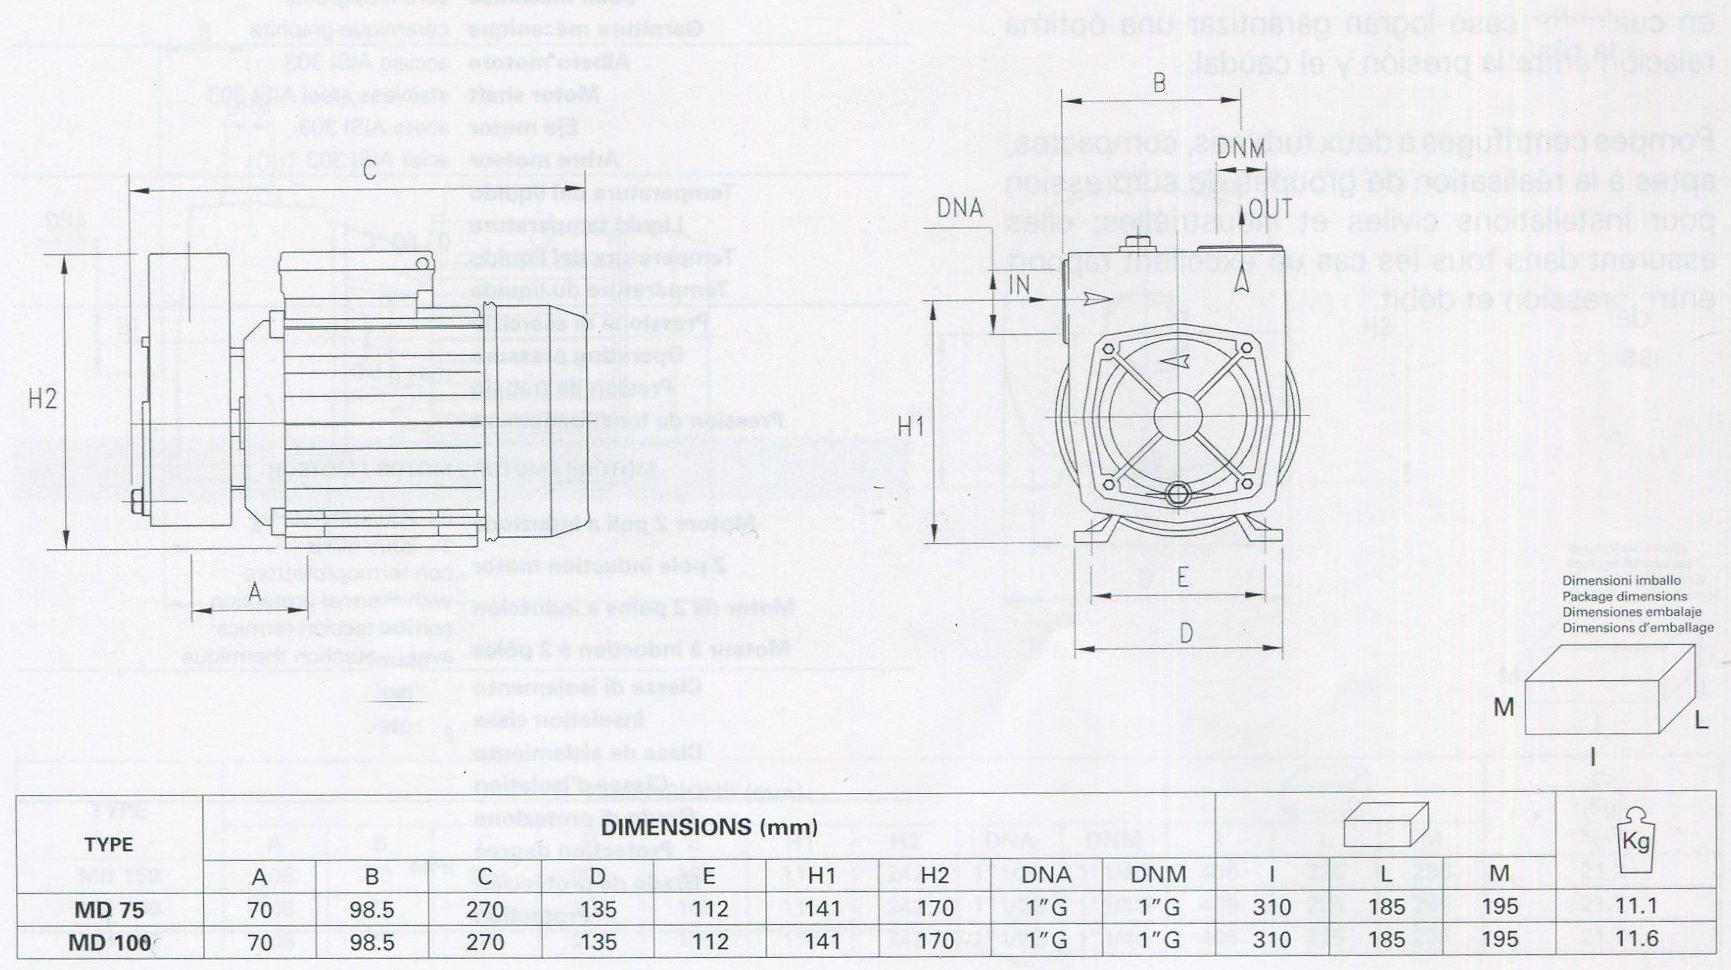 https://maybompentax.com.vn/images/2013/03/May-bom-pentax-trang21-duong-dac-tinh-02.jpg